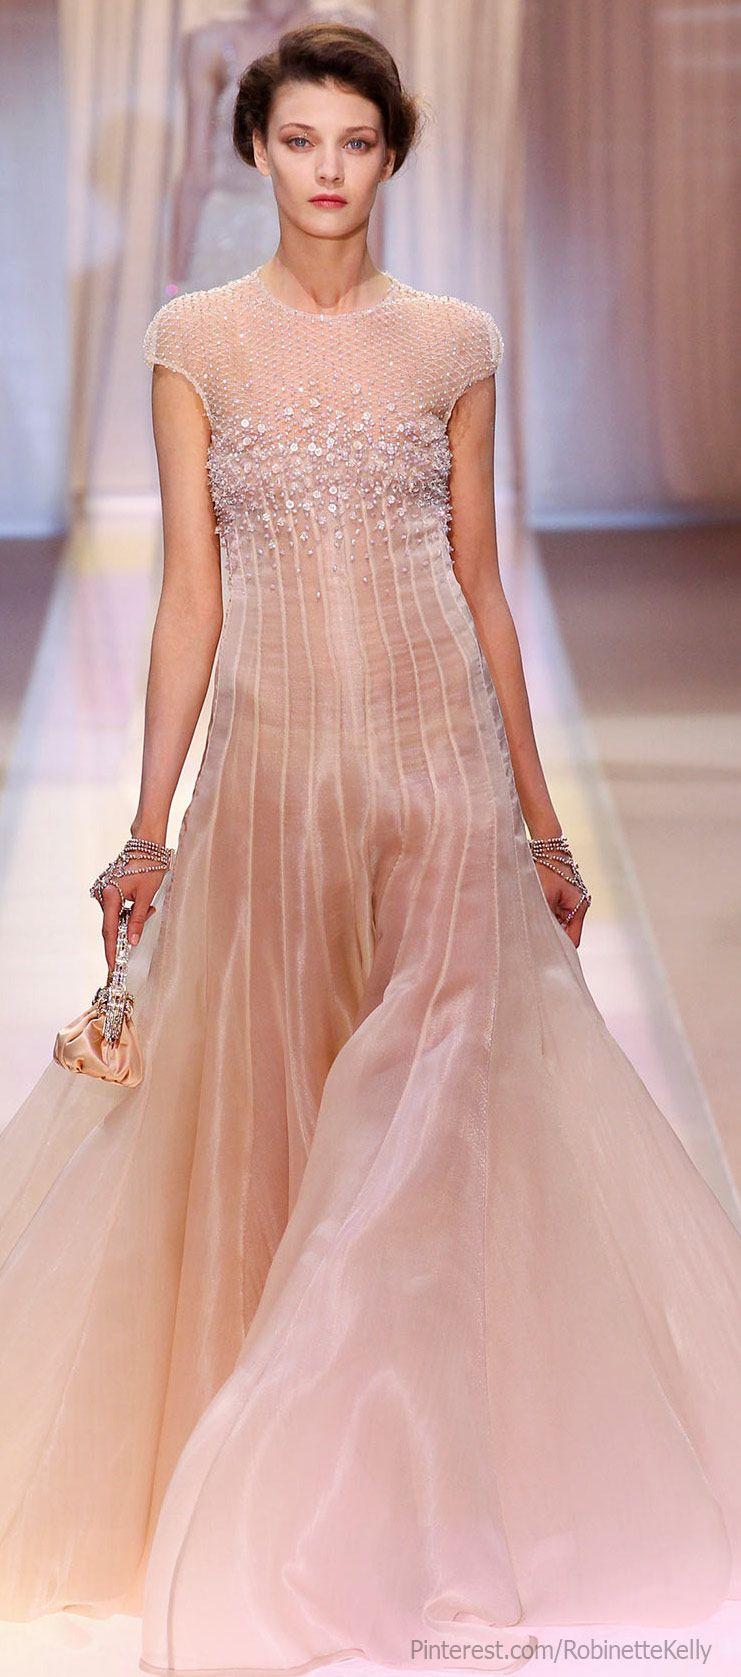 Armani Privé Haute Couture | wedding dresses and gowns | Pinterest ...